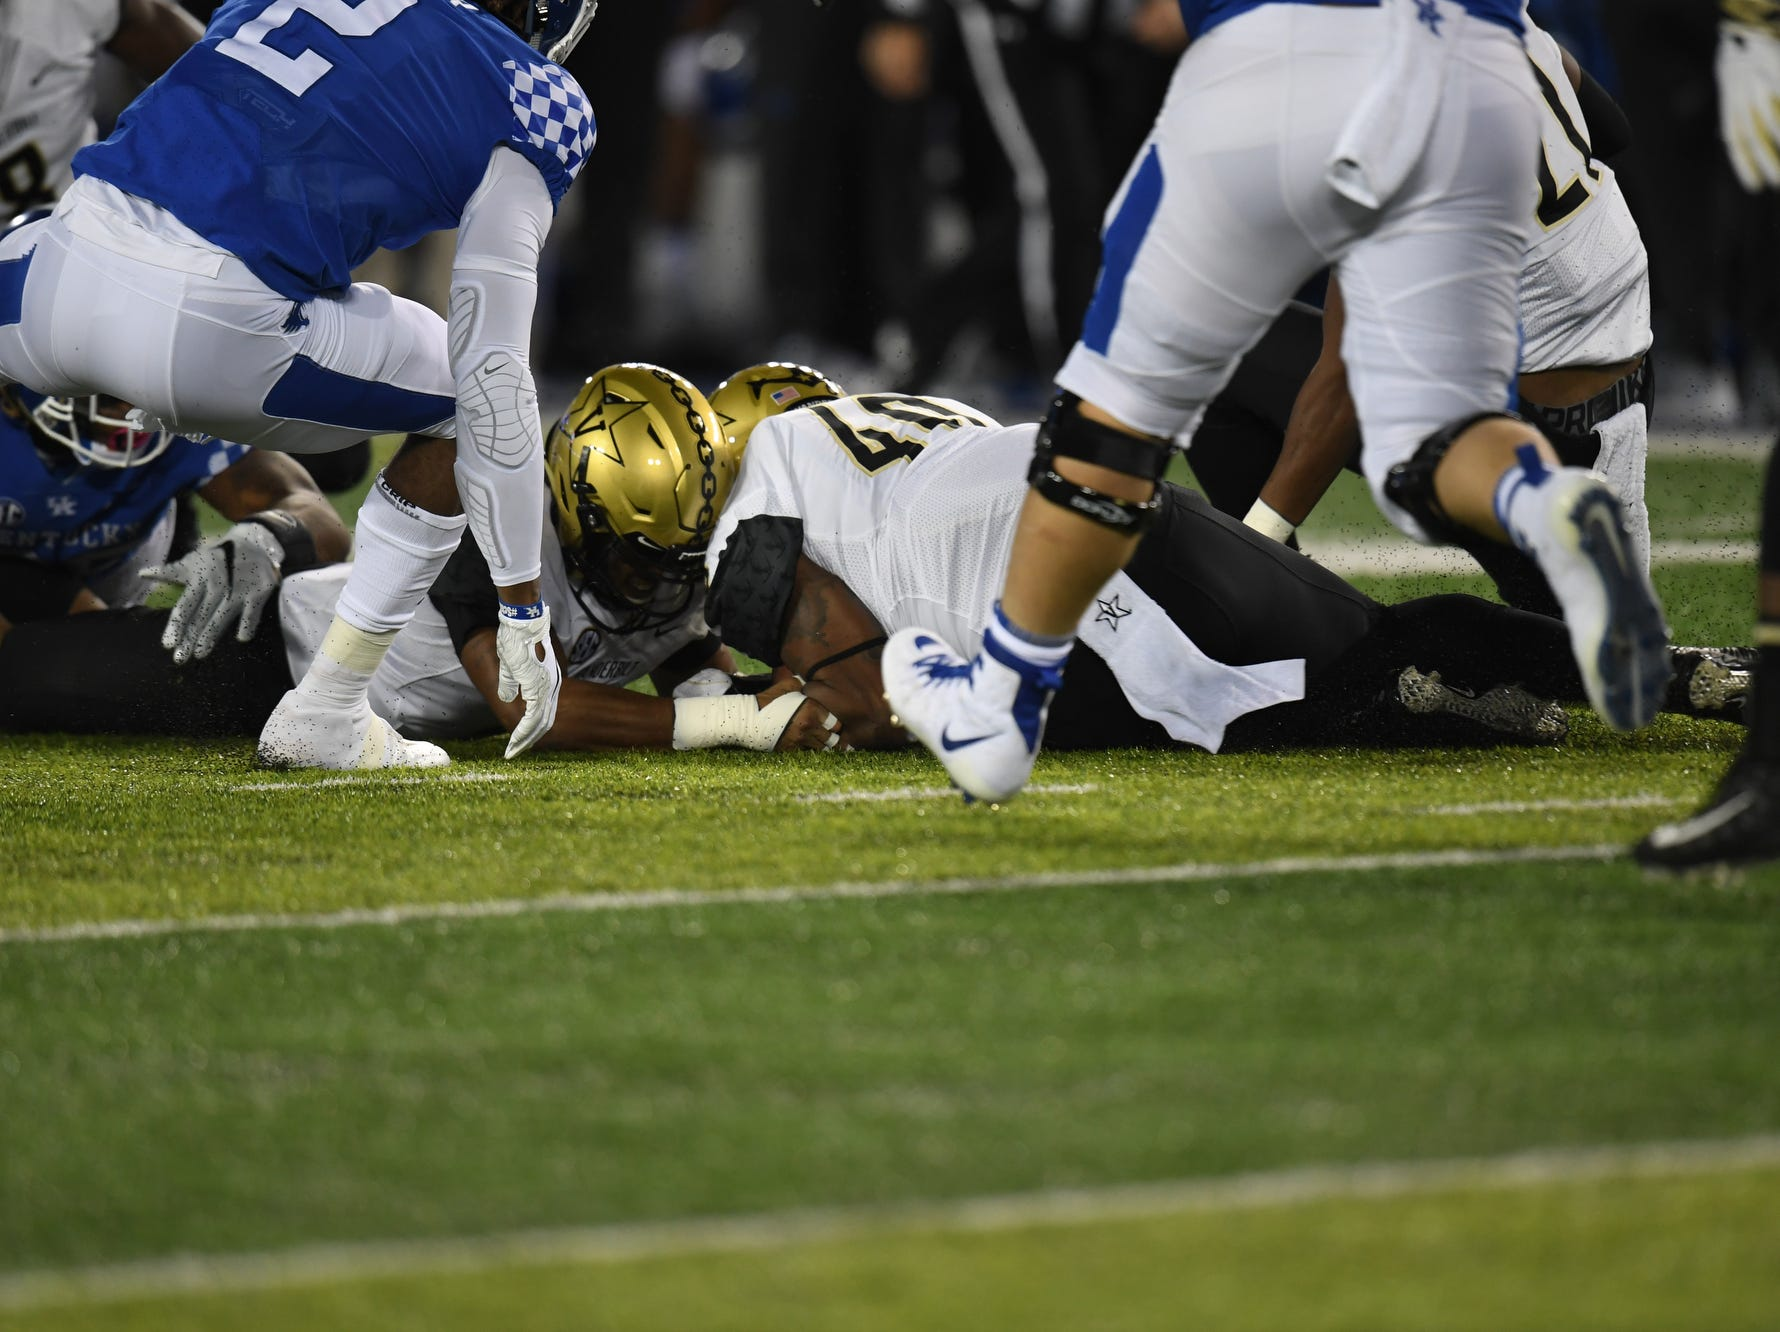 Vanderbilt recovers a fumble by UK QB Terry Wilson during the University of Kentucky football game against Vanderbilt at Kroger Field in Lexington, Kentucky on Saturday, October 20, 2018.